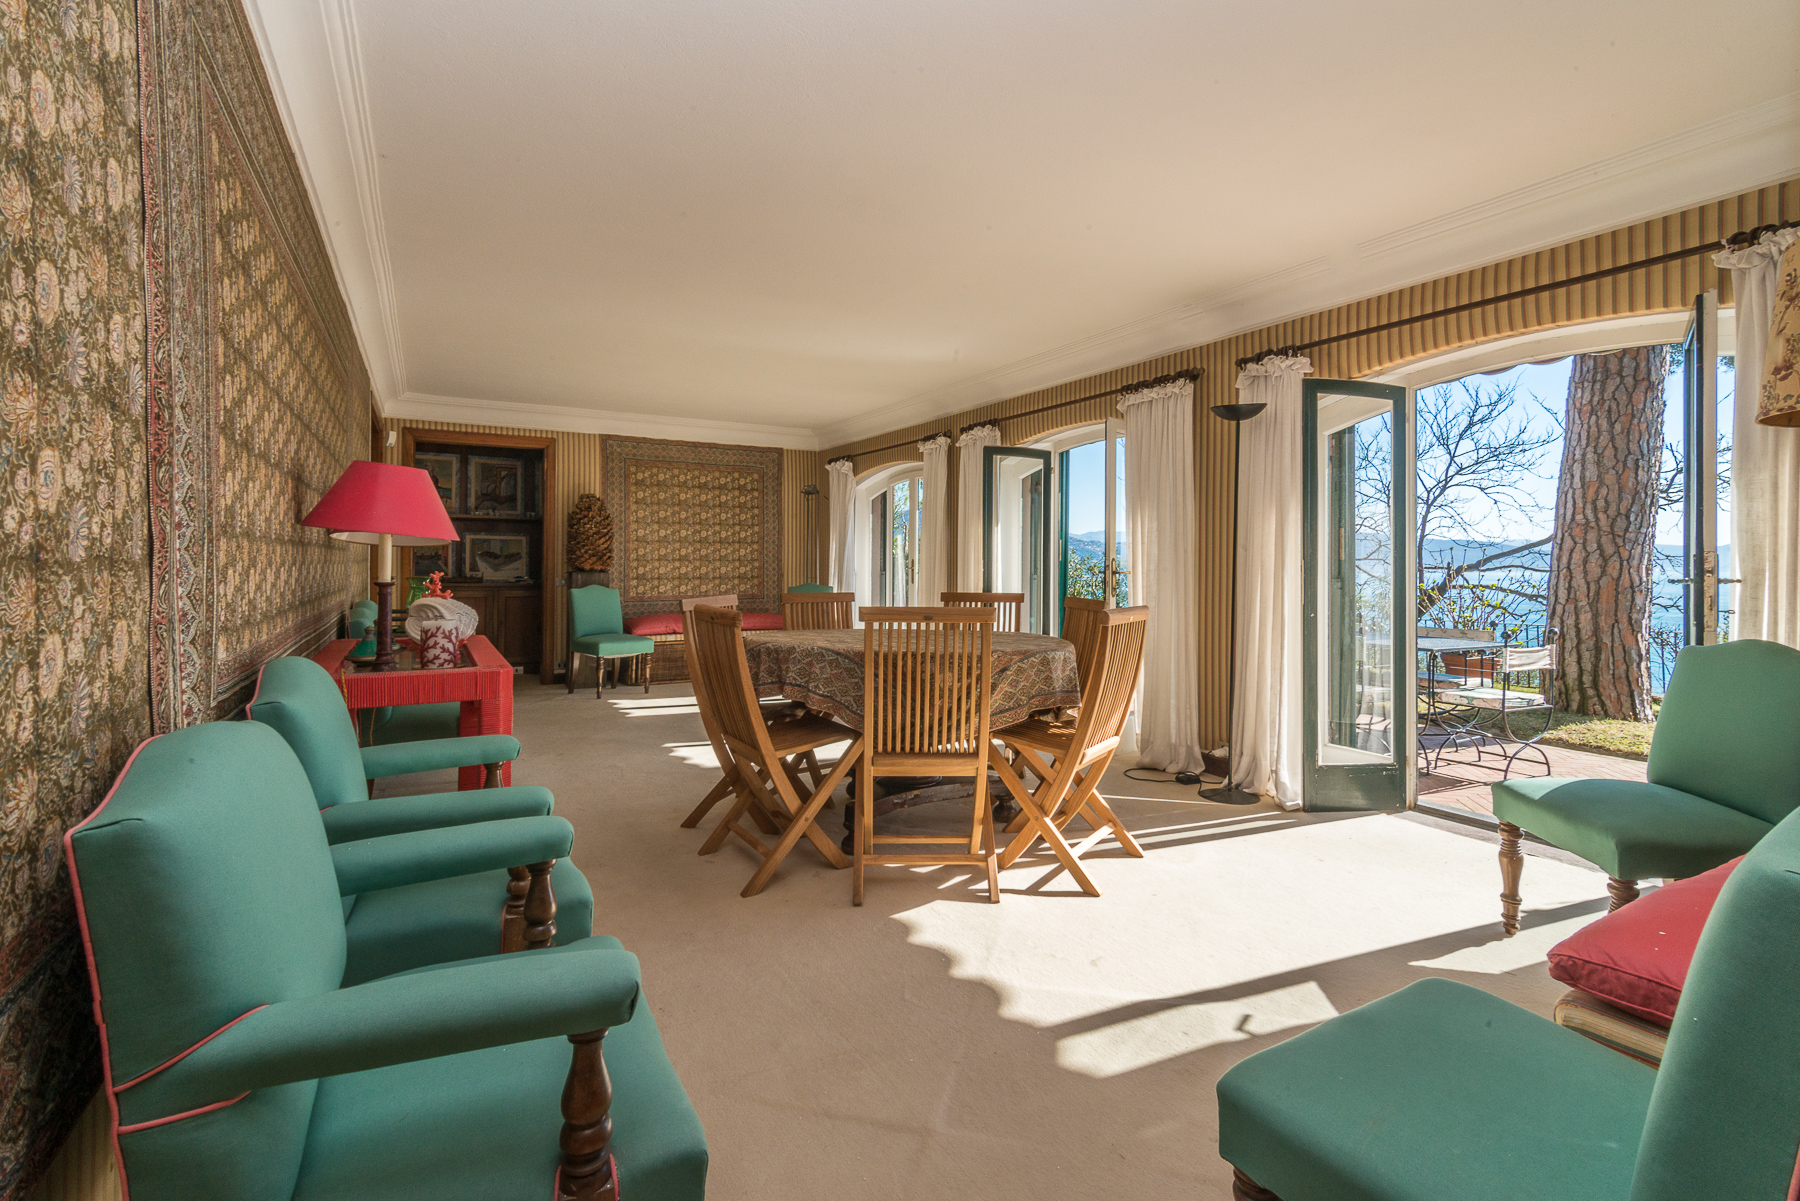 Villa in Vendita a Santa Margherita Ligure: 5 locali, 440 mq - Foto 11